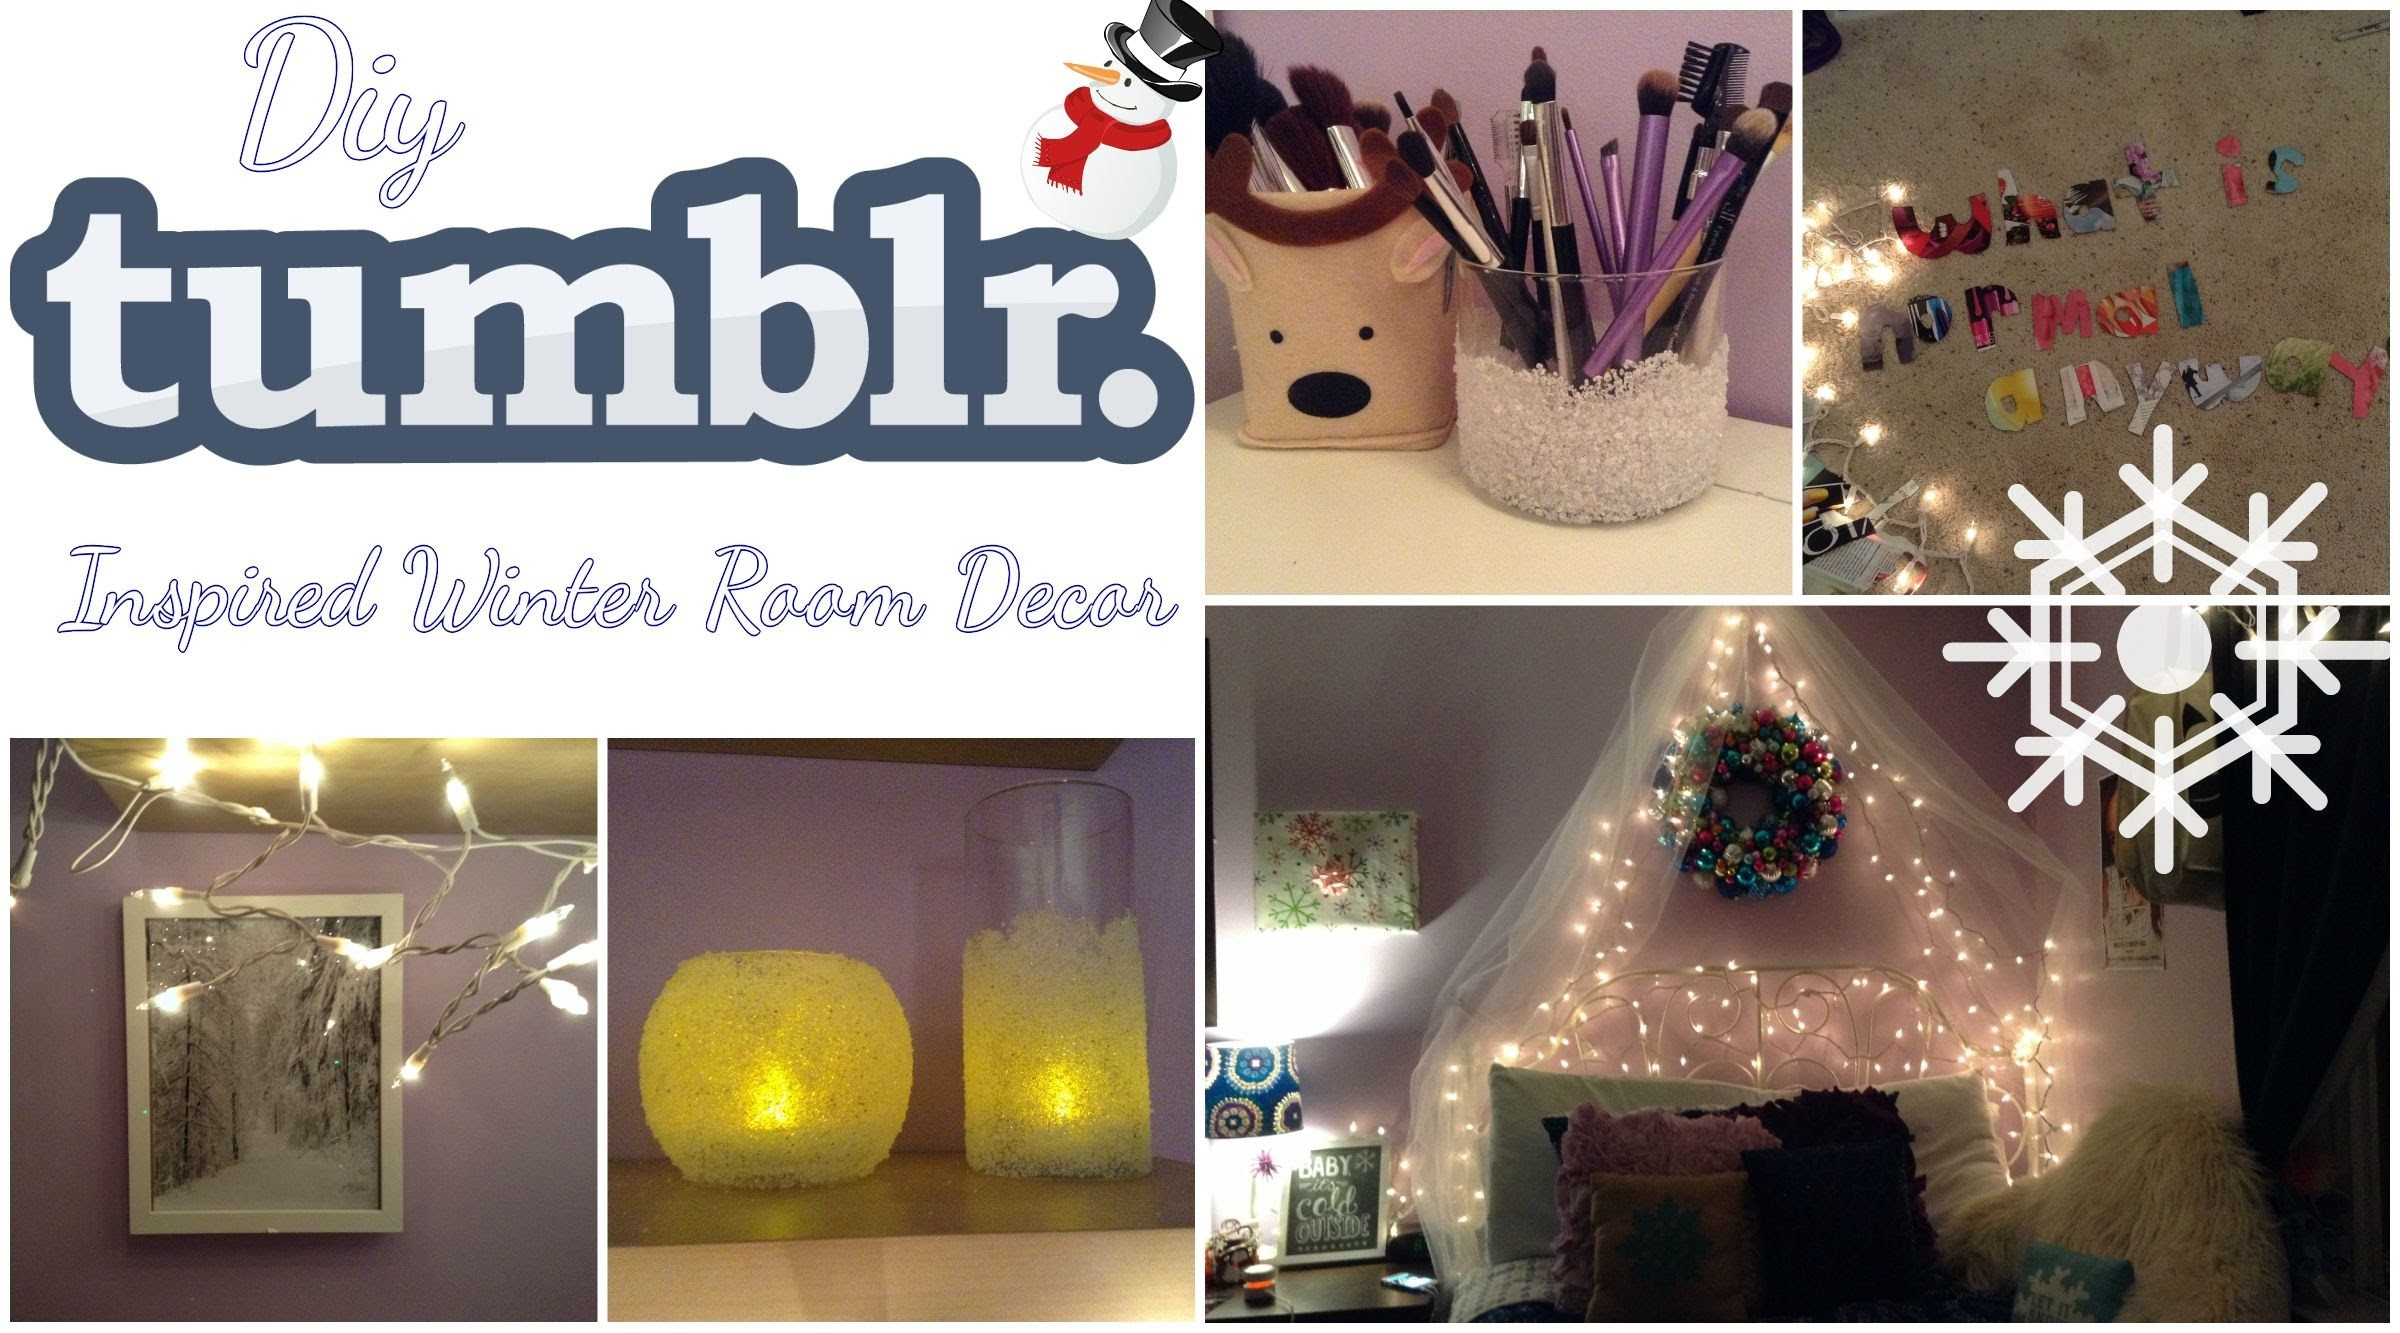 DIY Tumblr Inspired Winter Room Decor!